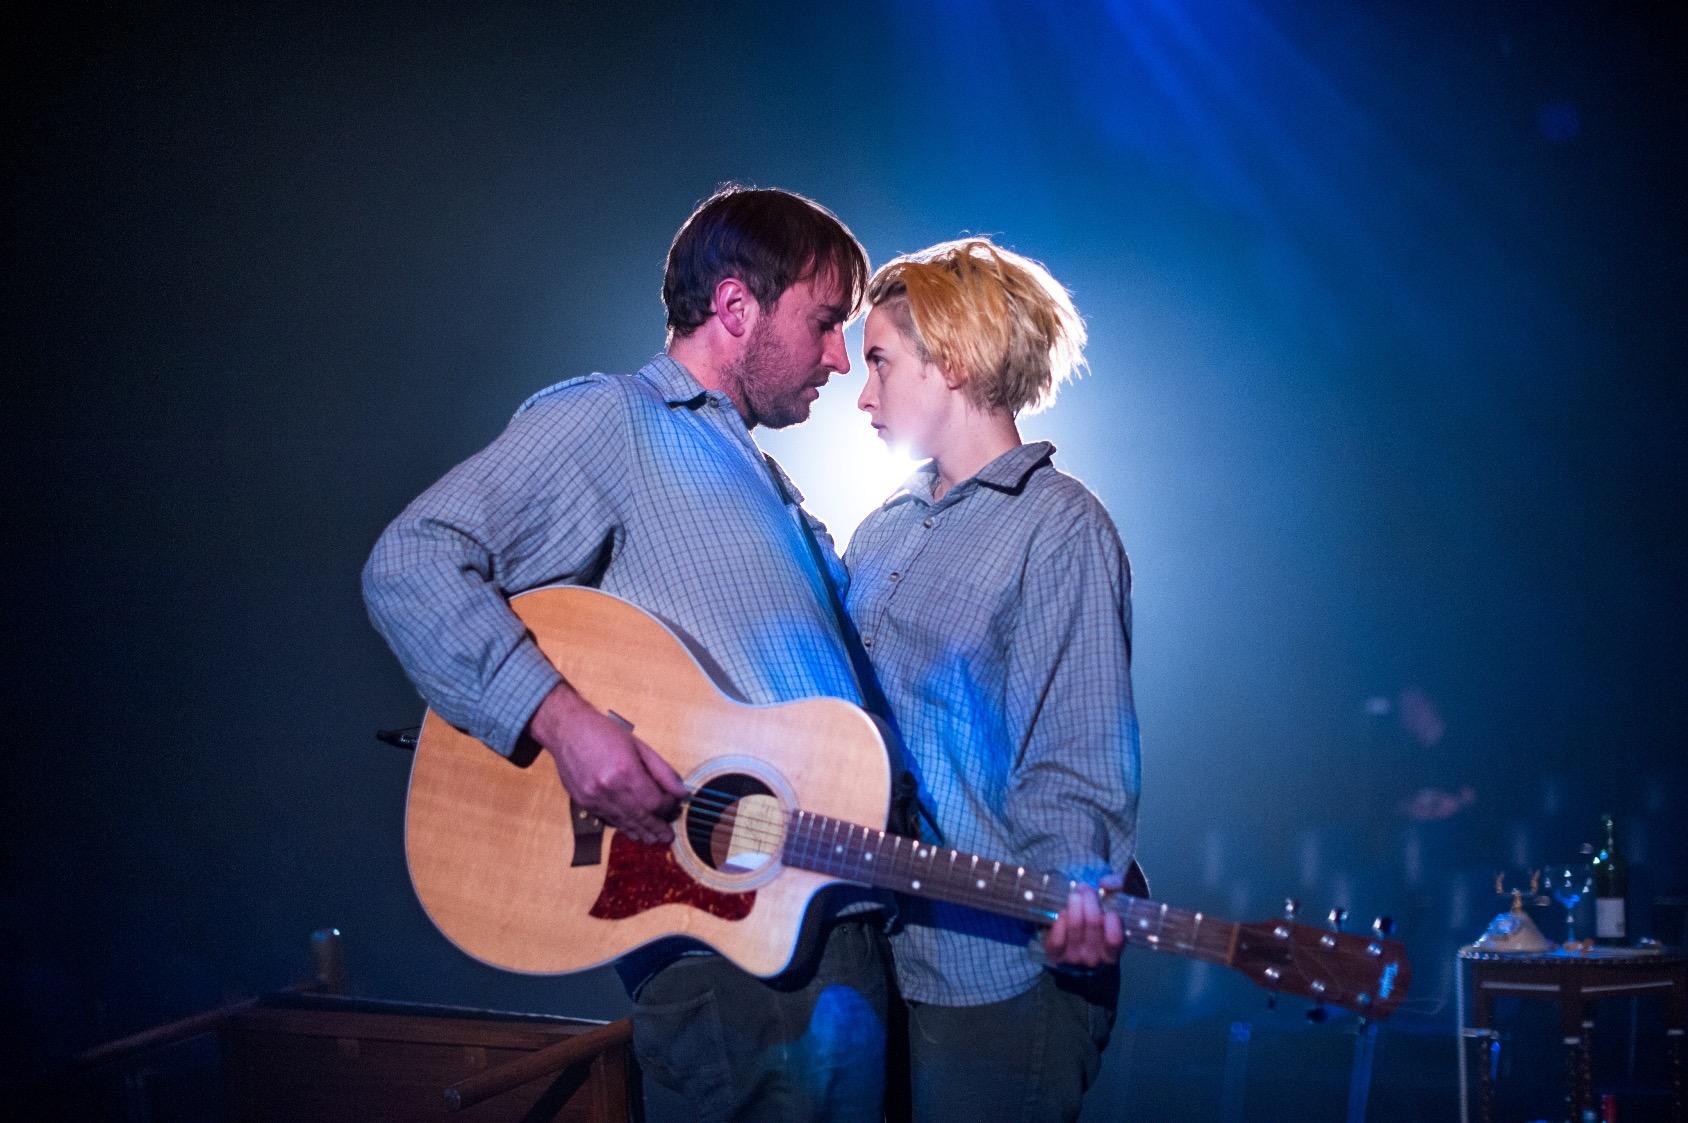 Love Song Dundee Rep Ensemble Ewan Donald (Beane) Sarah Swire (Molly).jpg